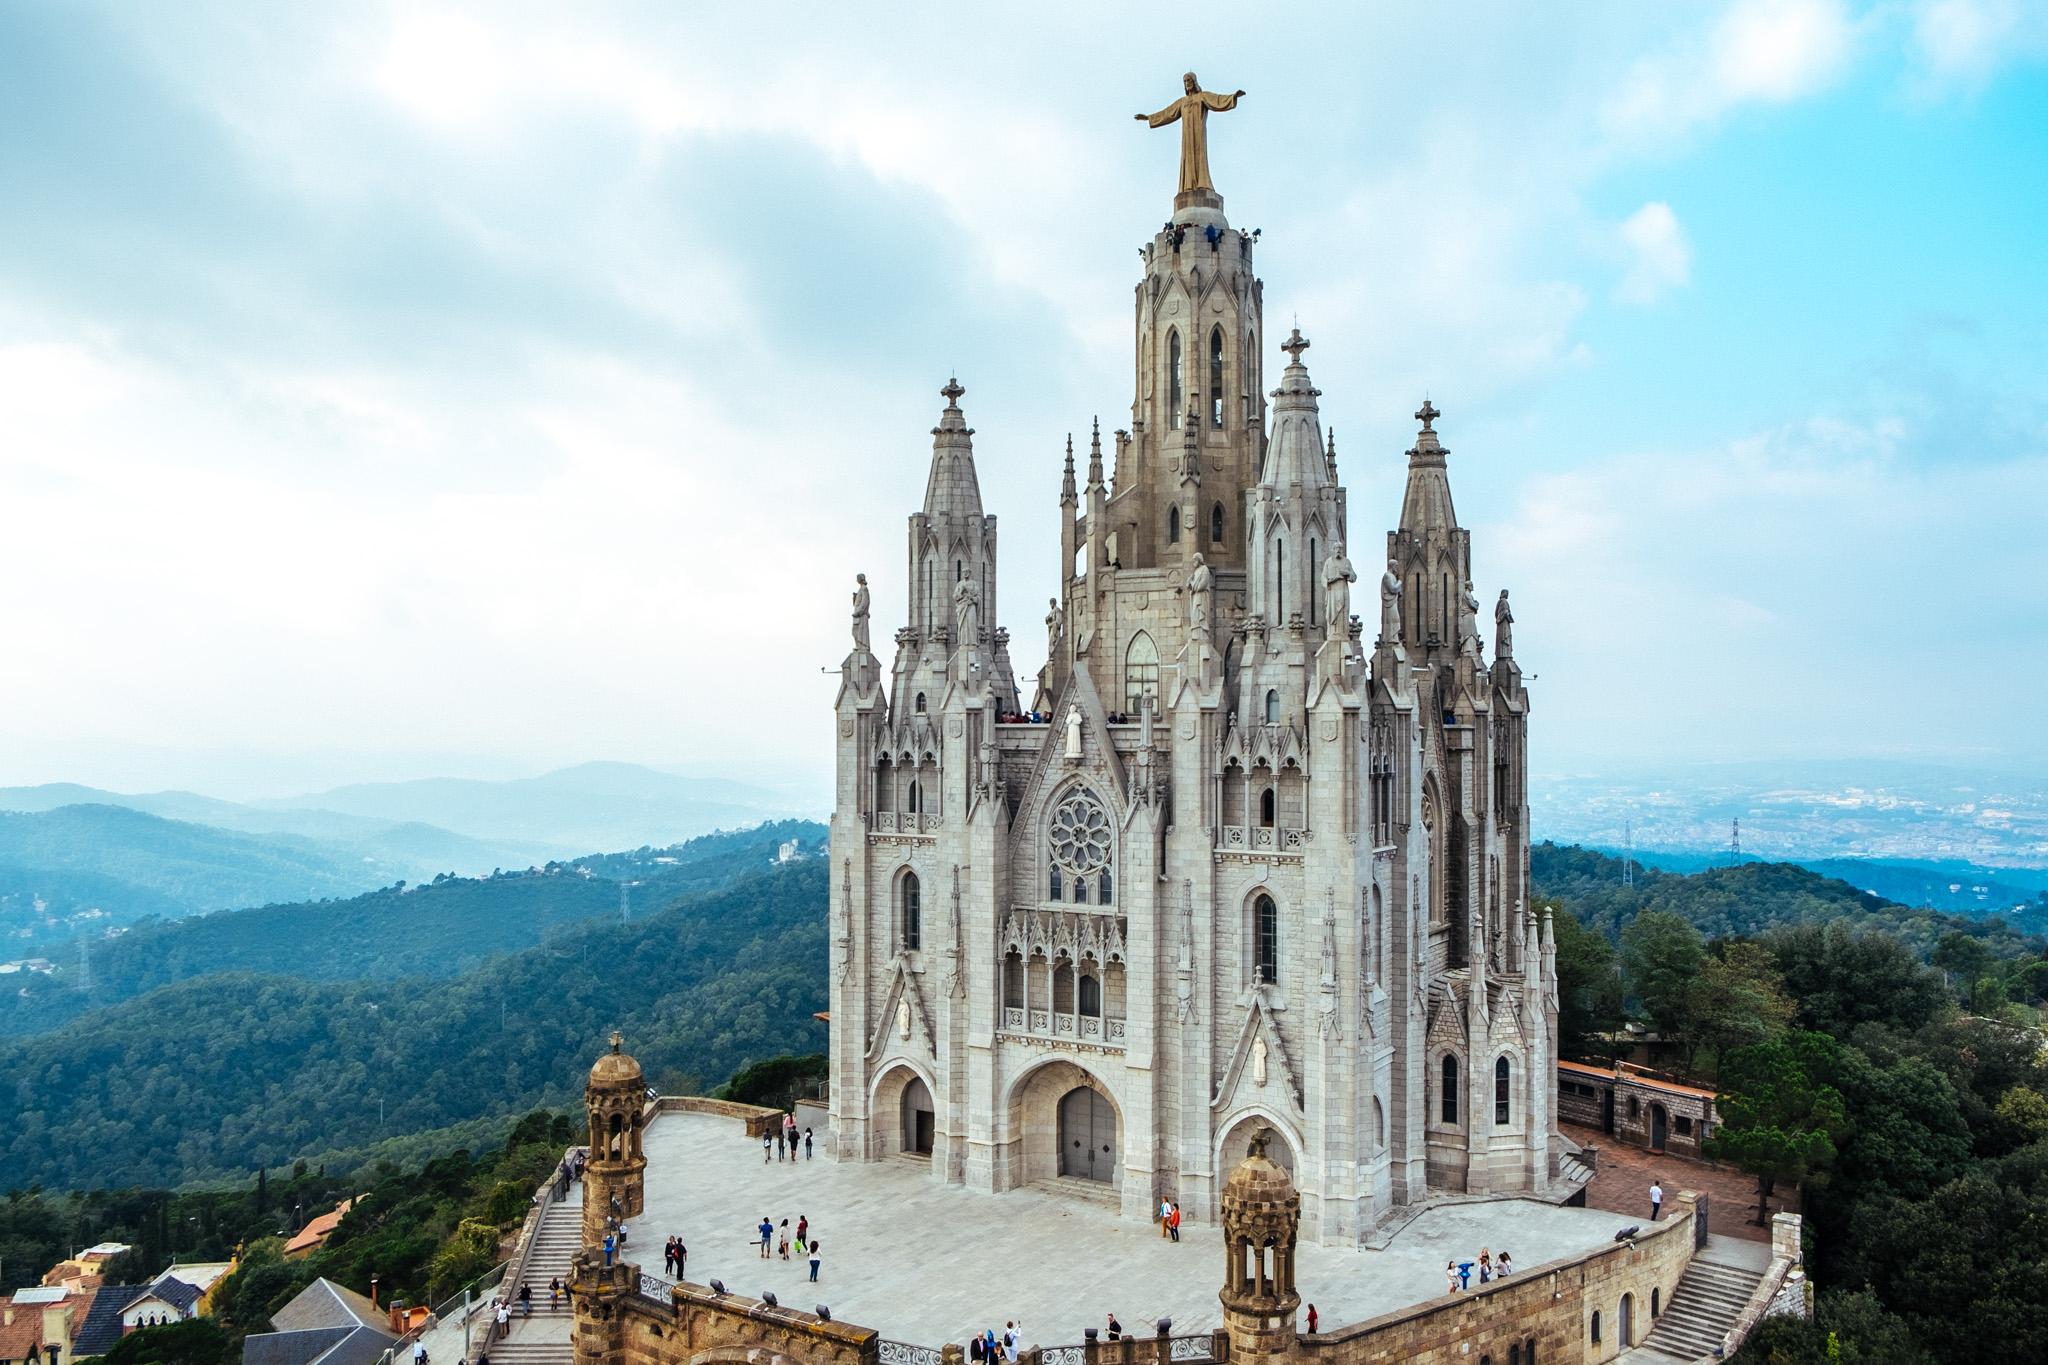 The Roman Catholic Sagrat Cor Church sits adjacent to the Tibidabo Amusement Park and is a beautiful minor basilica build in 1902.